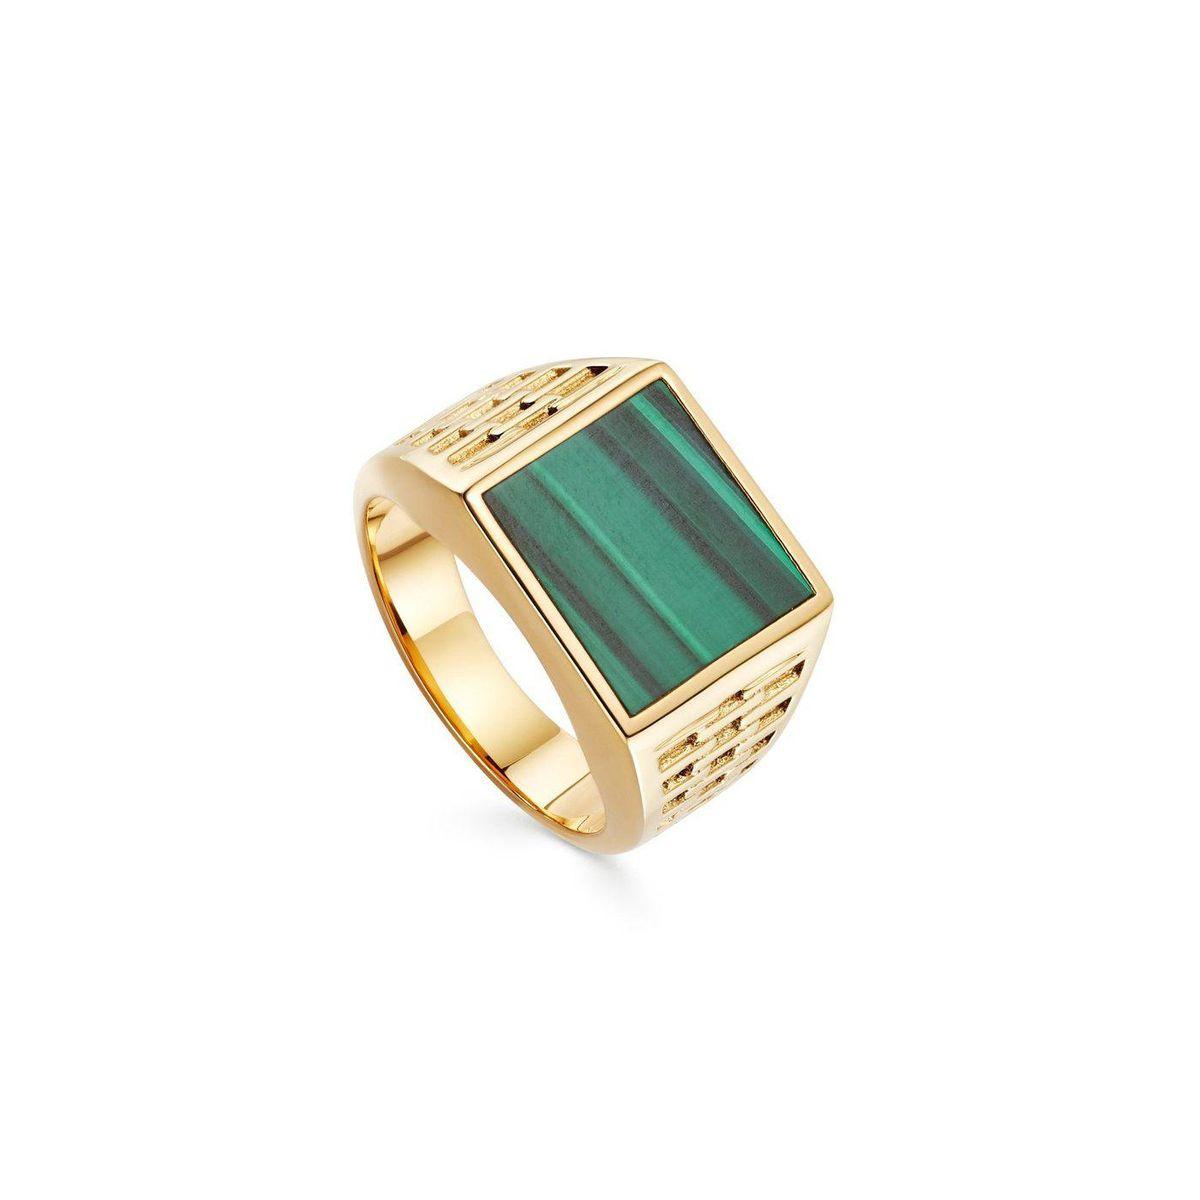 Fused Malachite Woven Square Signet Ring